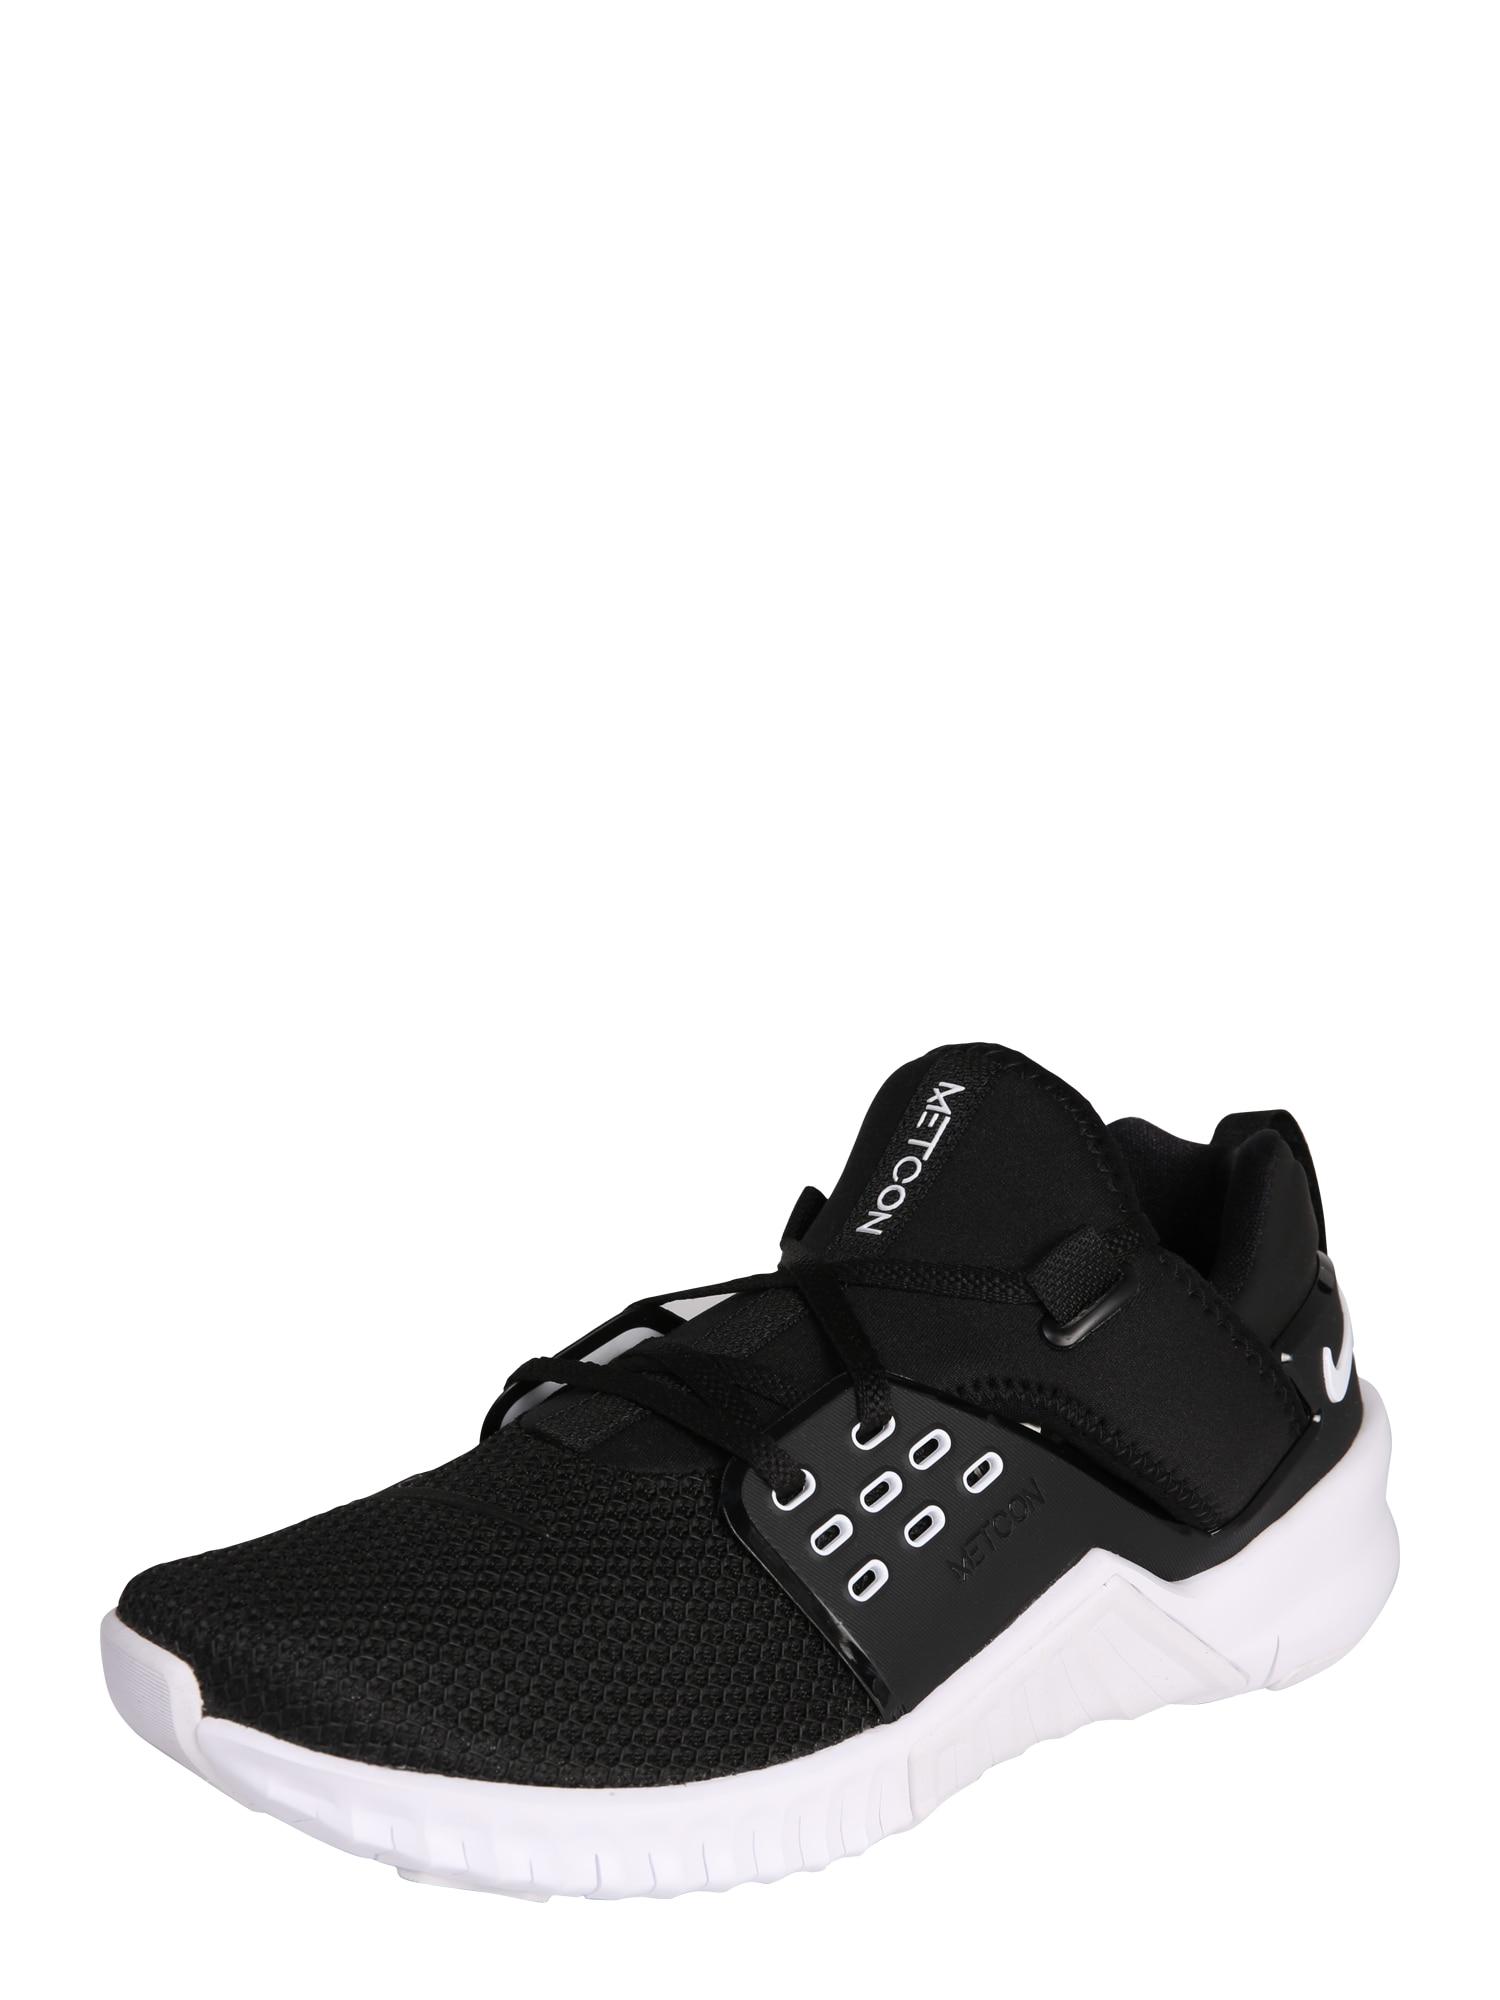 Sportovní boty FREE METCON 2 černá bílá NIKE